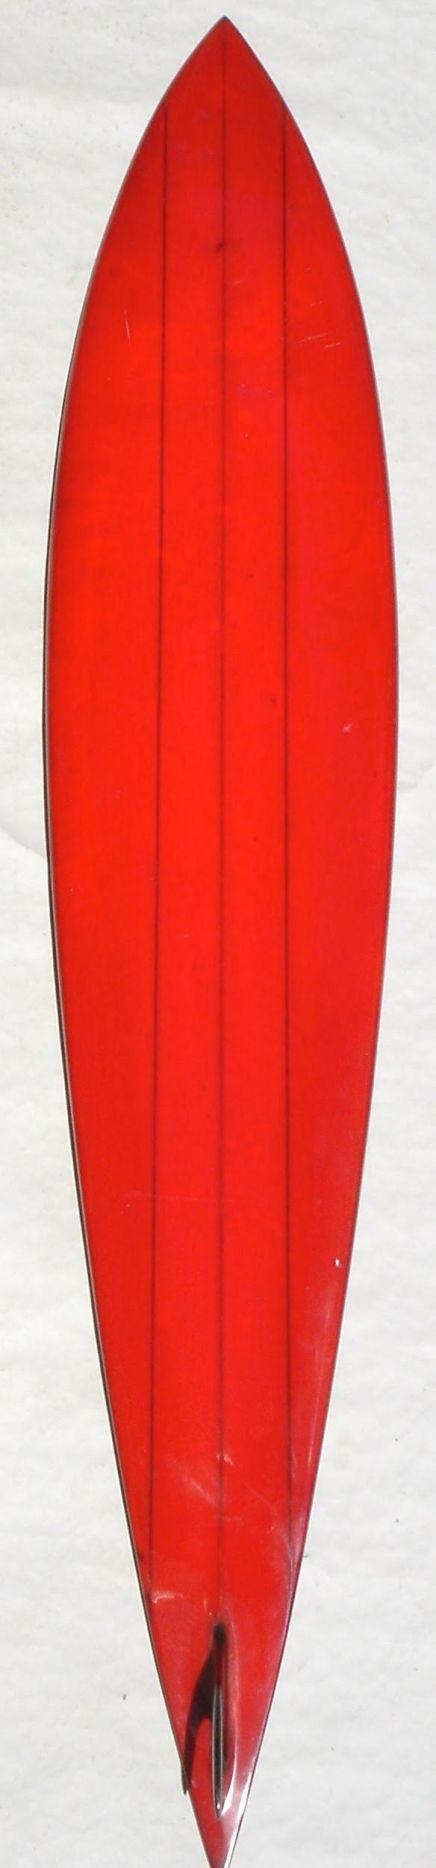 Rick Surfboards Barry Kanaiaupuni Personal Rider Randy Rarick 1